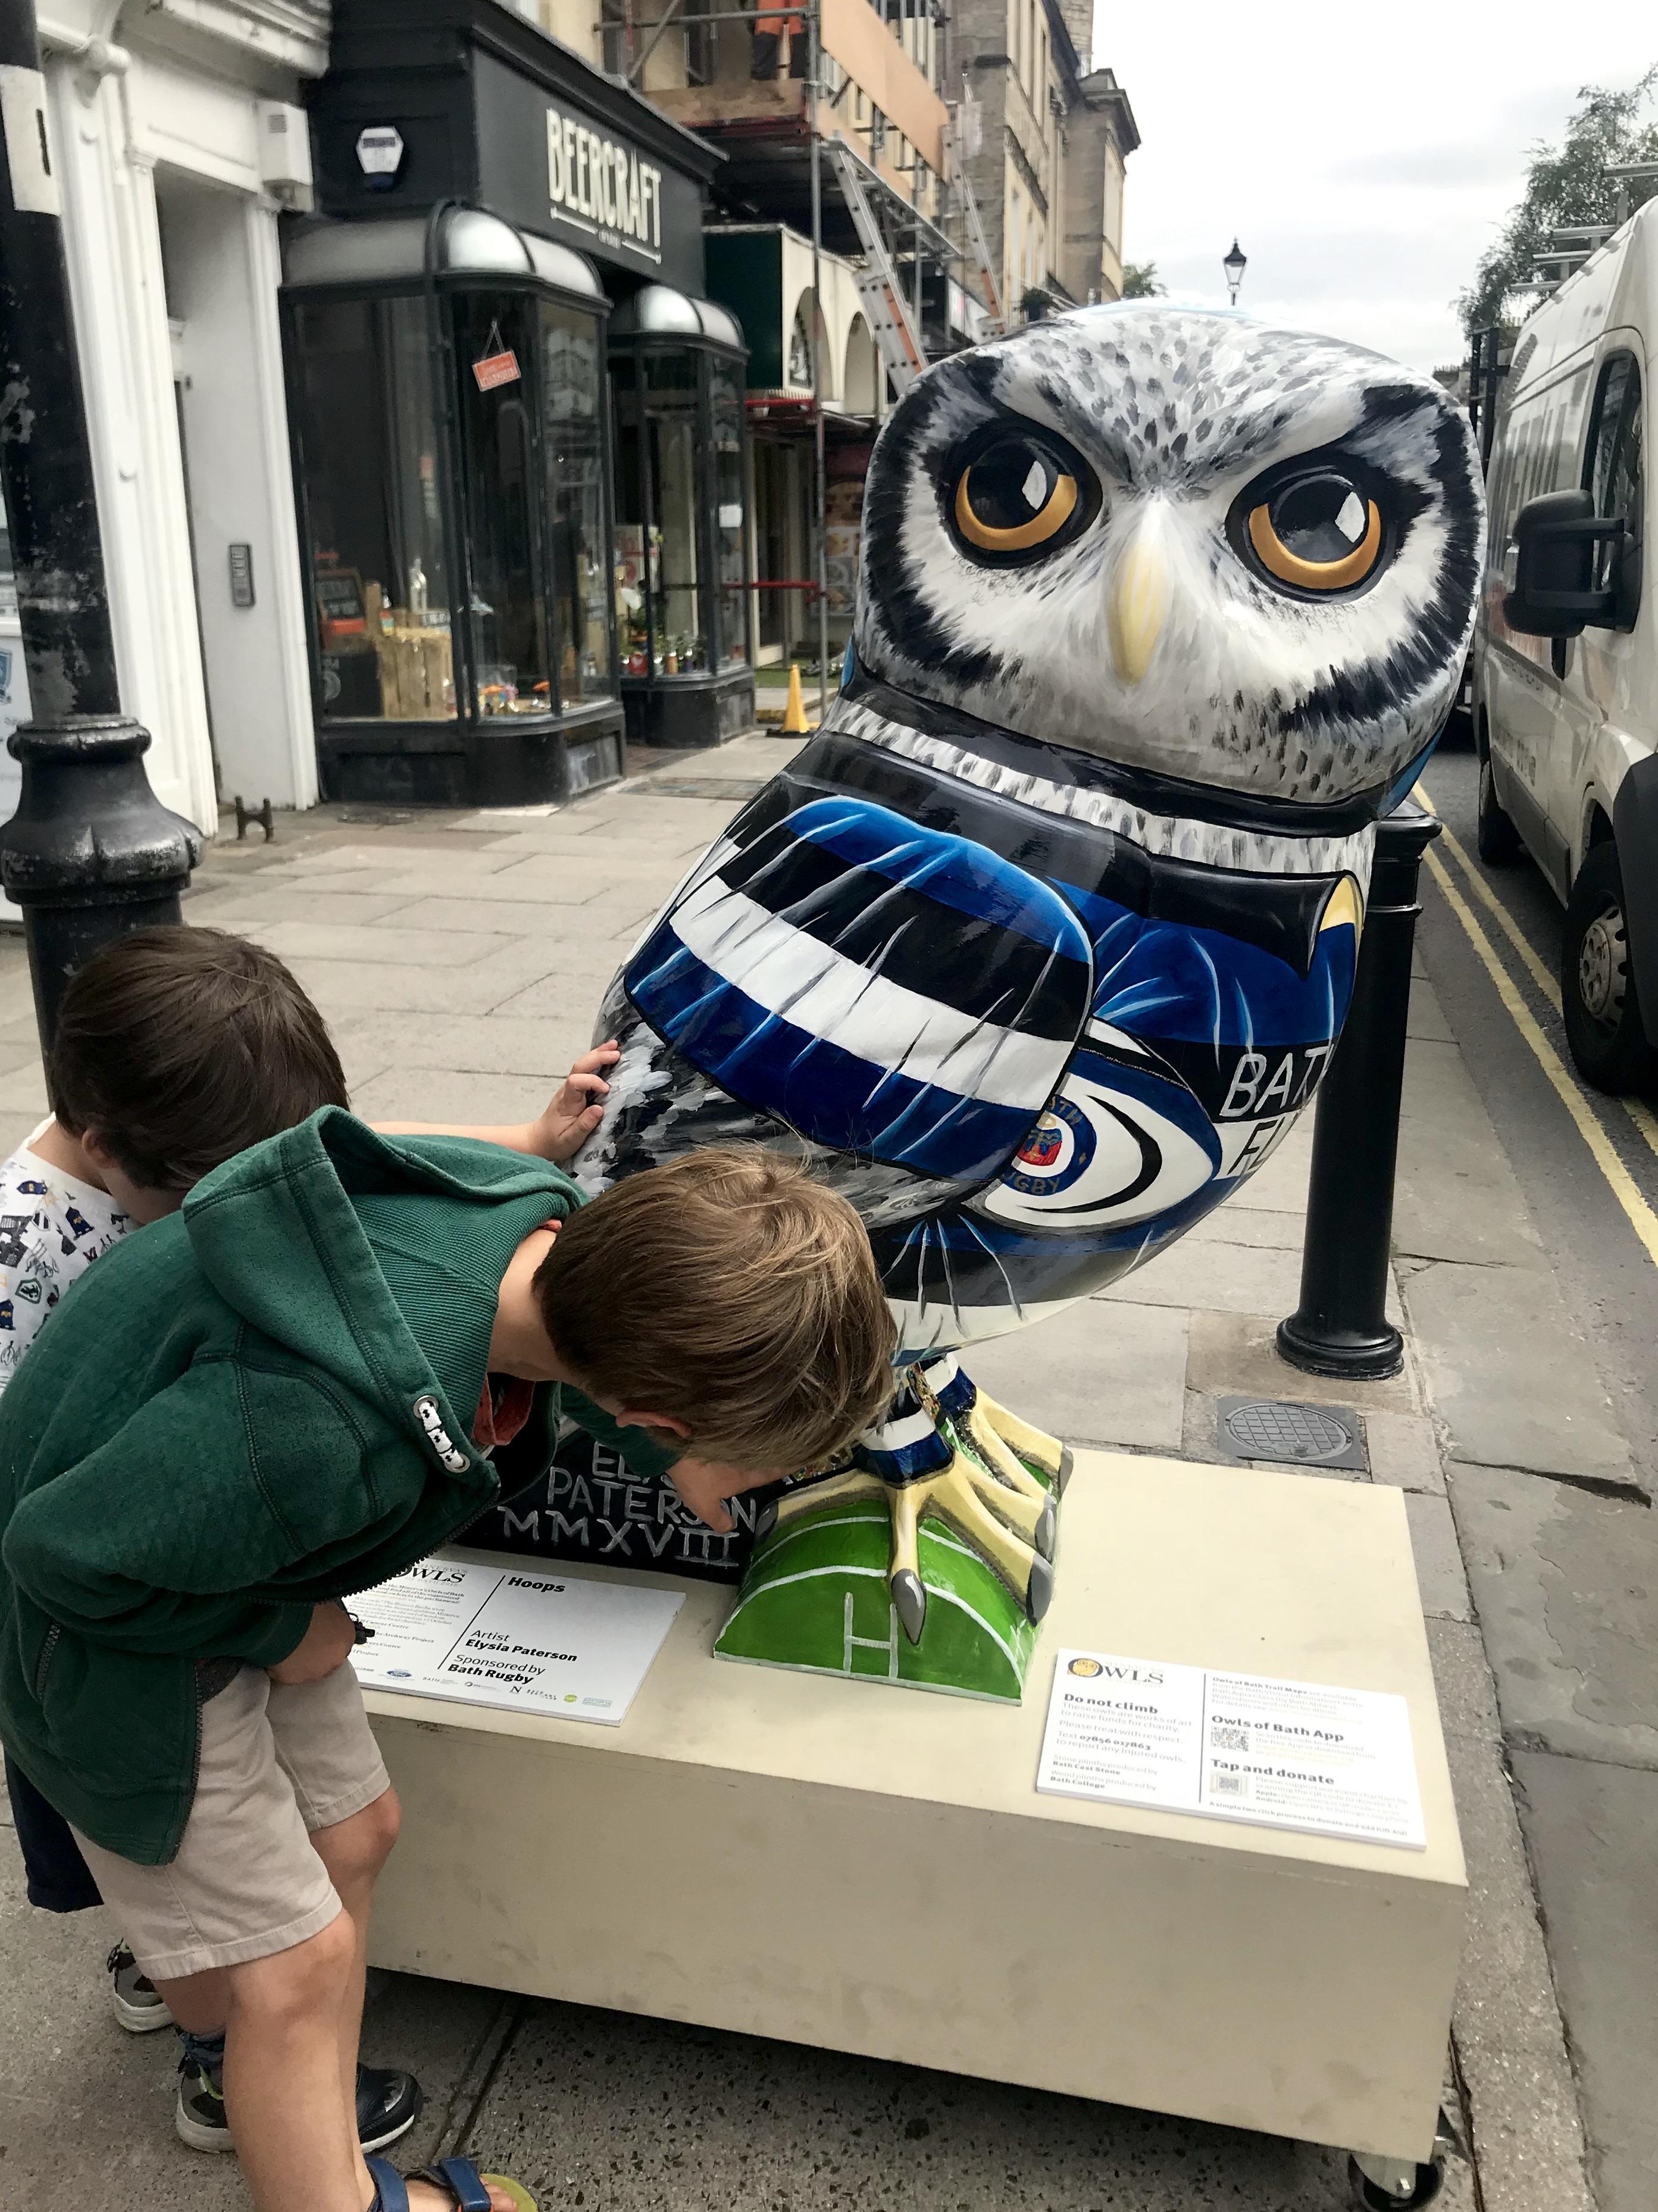 Mivera Owls of Bath